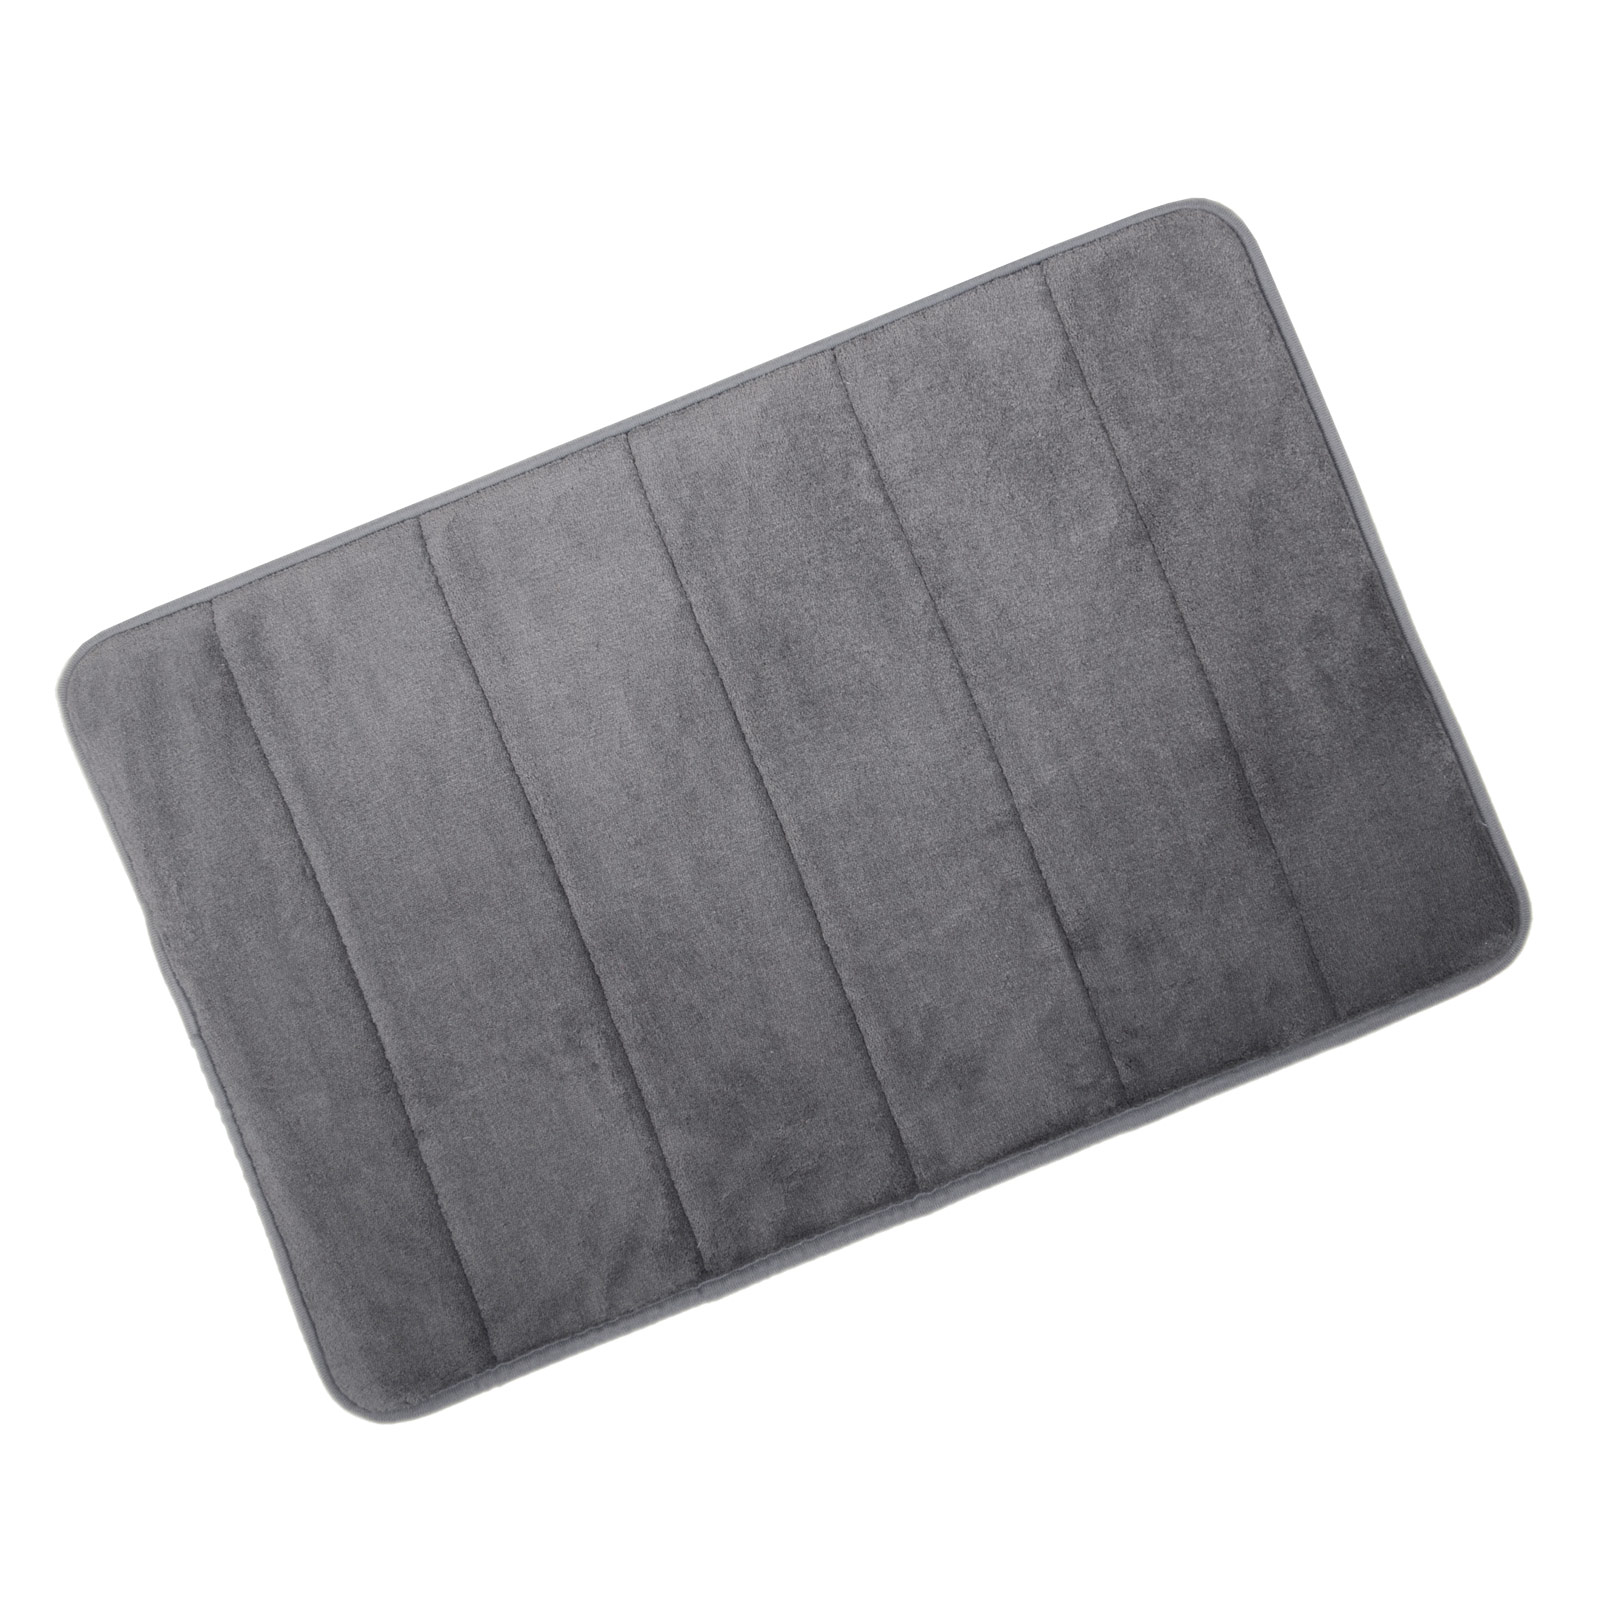 Microfibre Memory Foam Bathroom Shower Bath Mat With Non